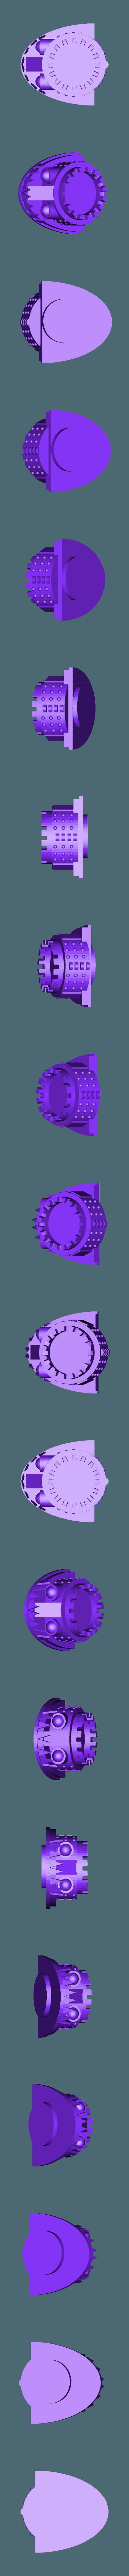 Gork_head.stl Télécharger fichier STL gratuit Ork Great Gargant 6mm Epic Scale Proxy model • Objet à imprimer en 3D, redstarkits